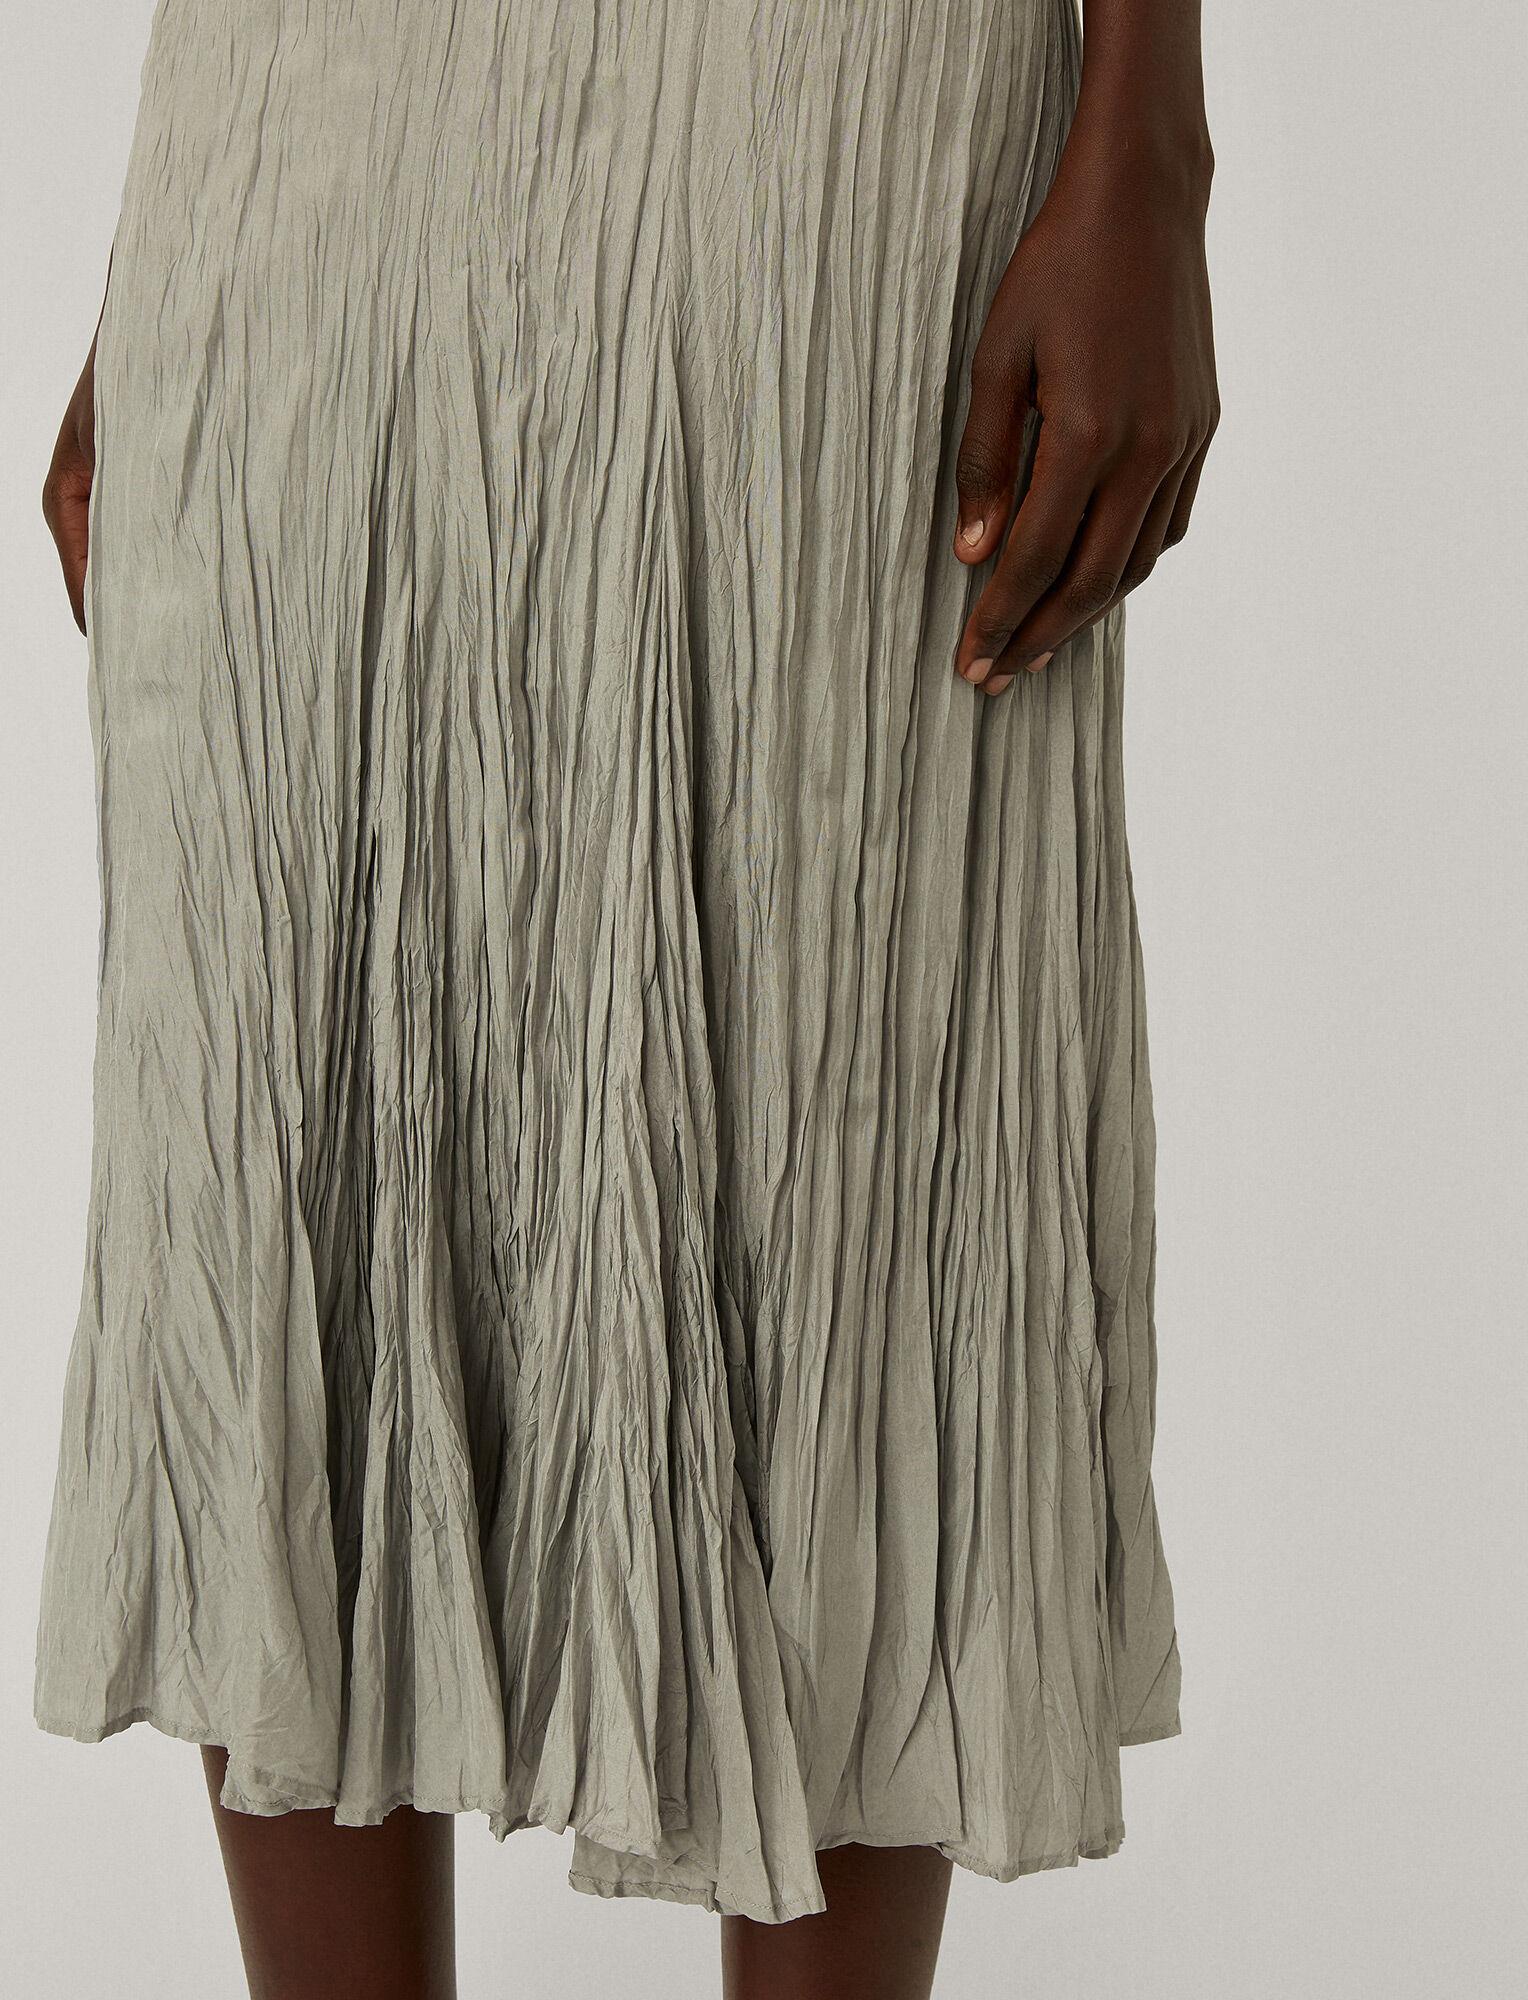 Joseph, Habotai Desvignes Dress, in CLOUD